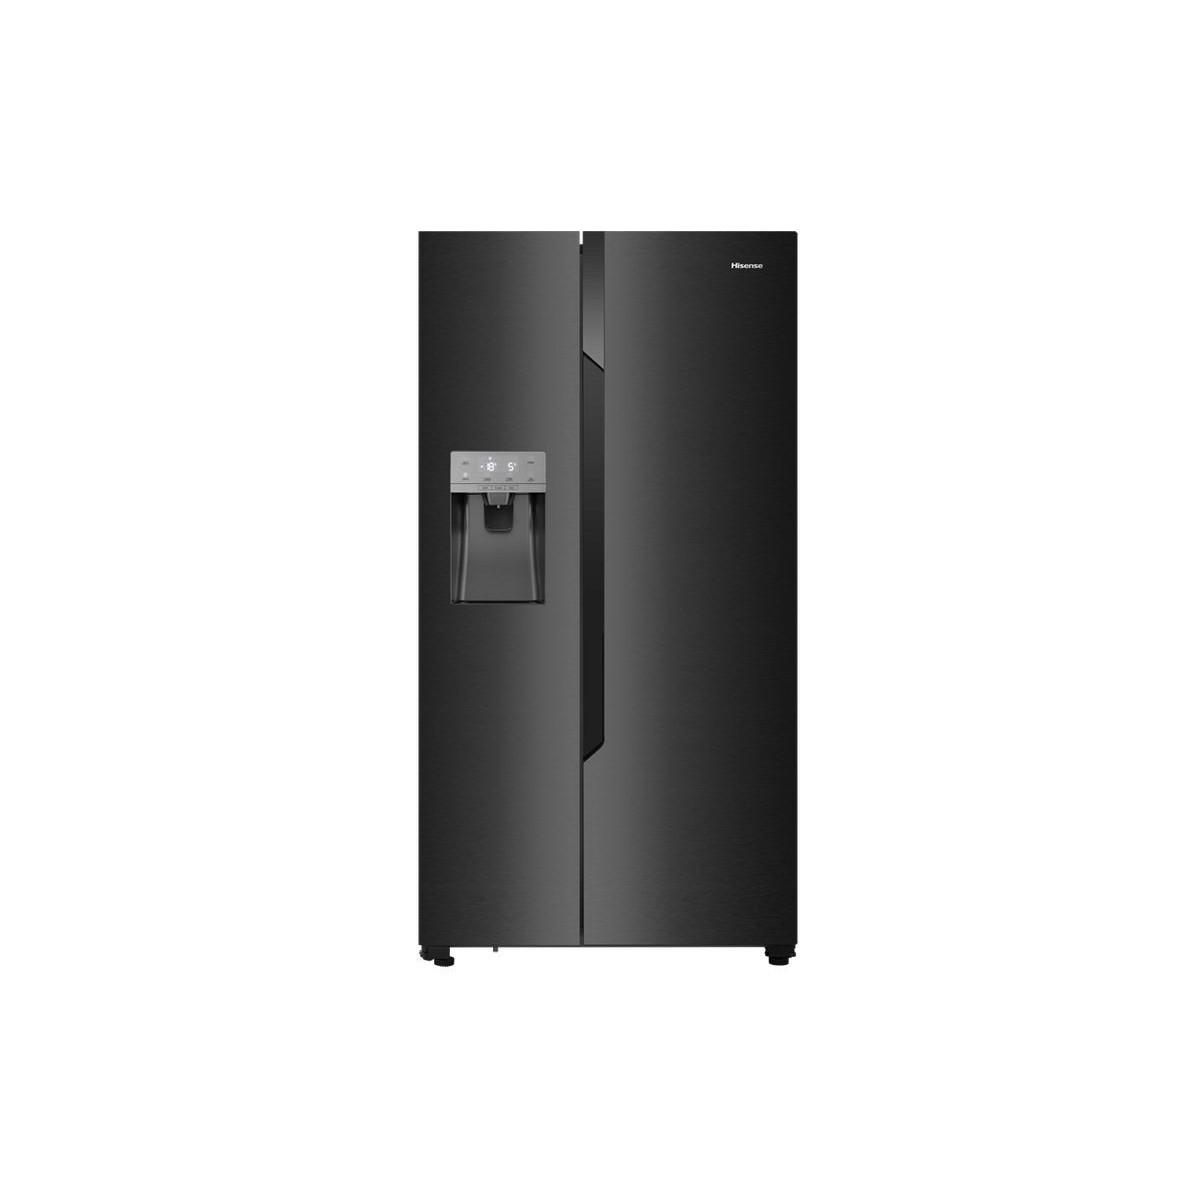 Frigorifico americano hisense rs694n4tf2 clase a 179cm - Medidas frigorifico americano ...